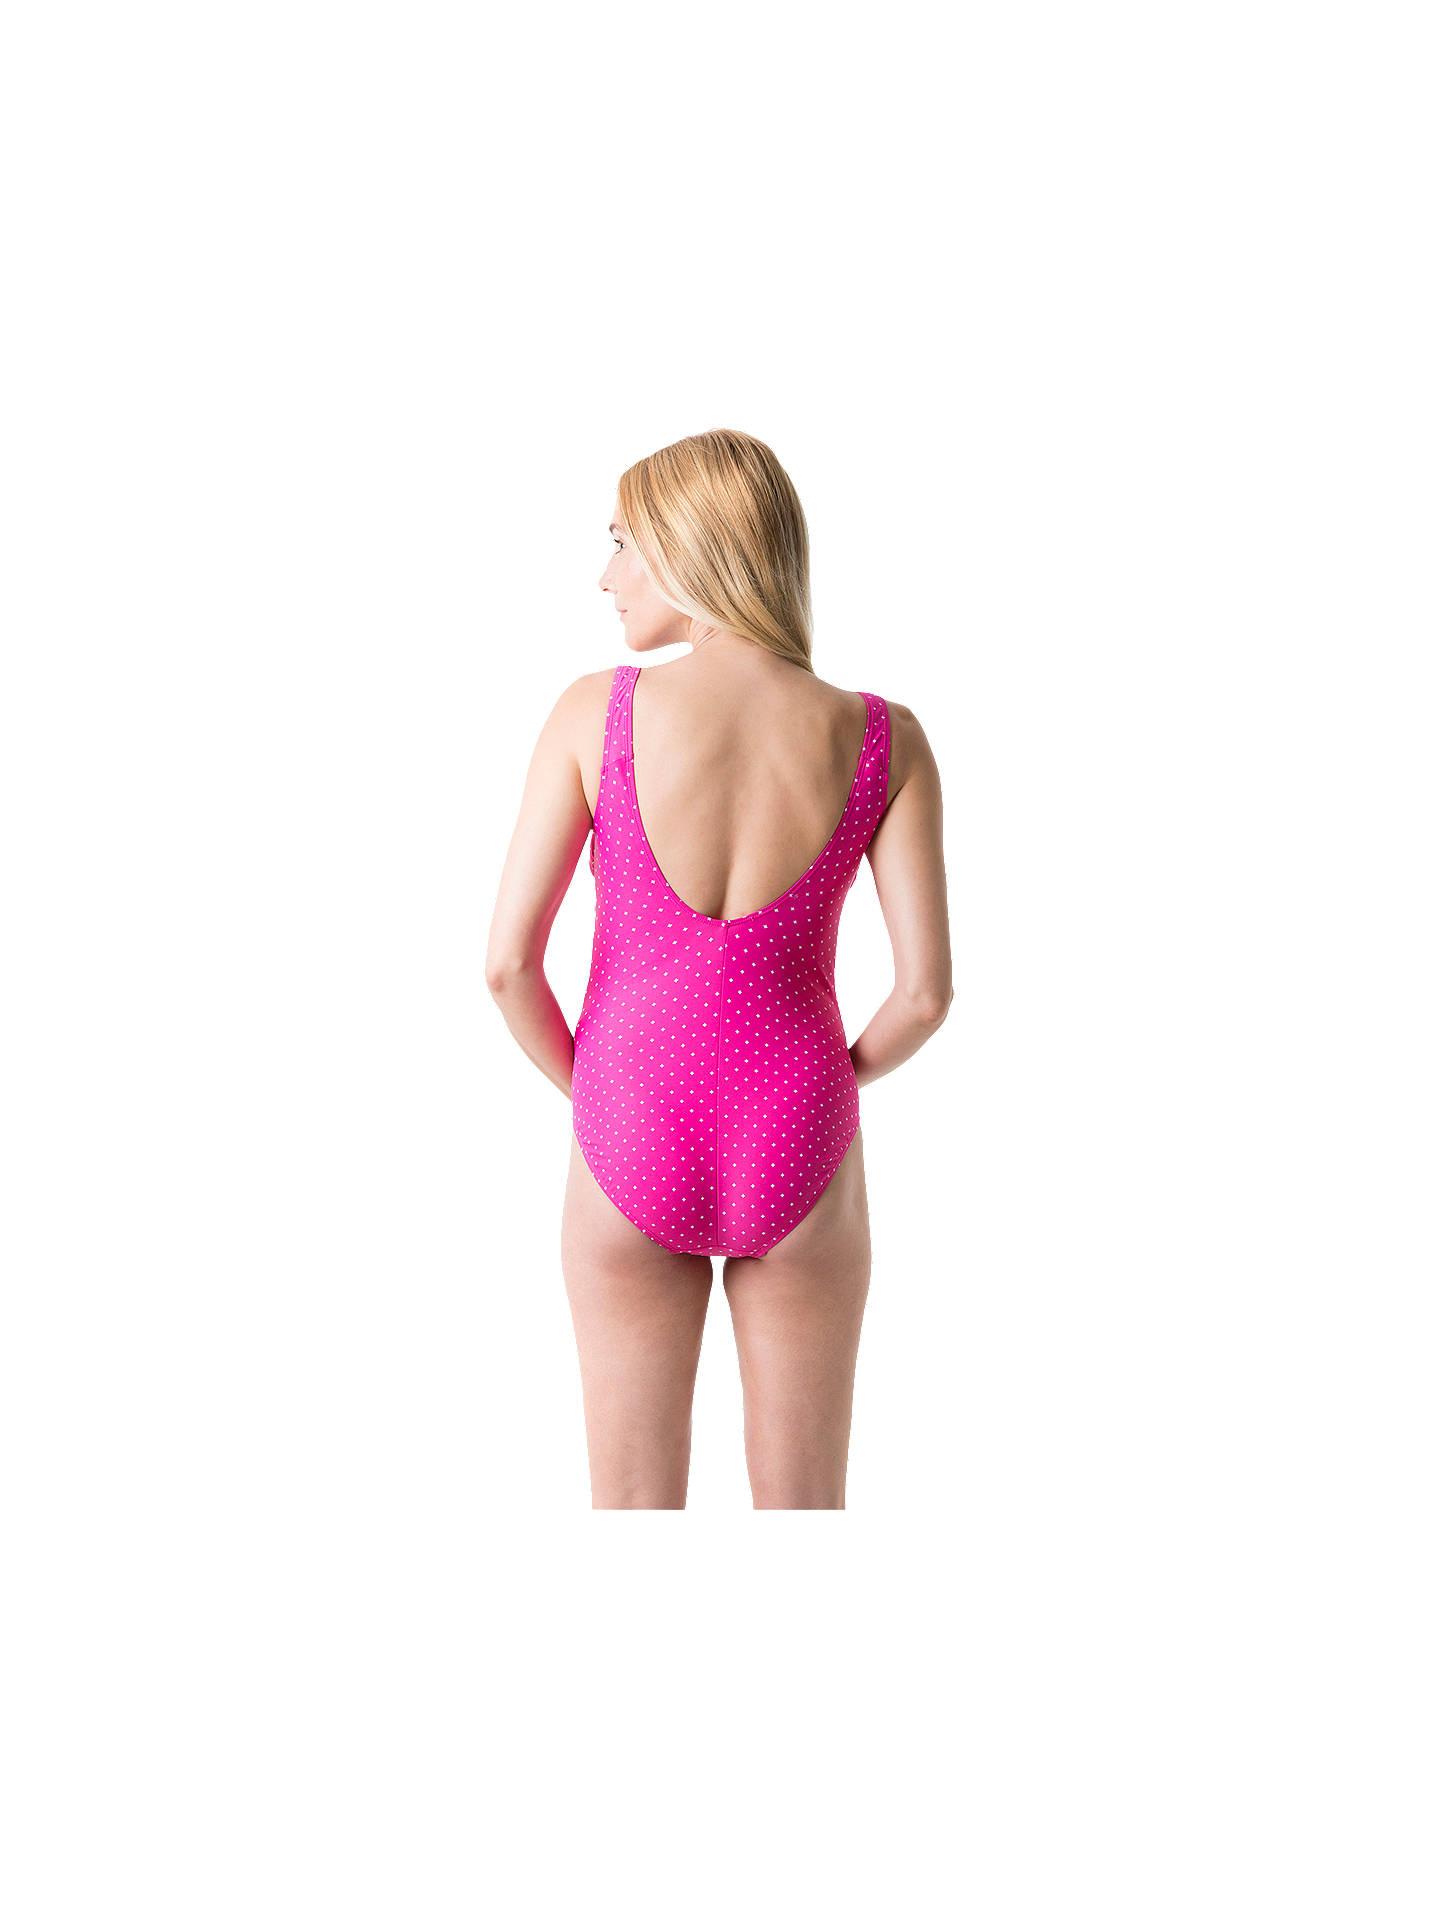 21c50d27efab8 ... Buy Speedo's Essential Grace U-Back Maternity 1 Piece Swimsuit,  Pink/White, ...